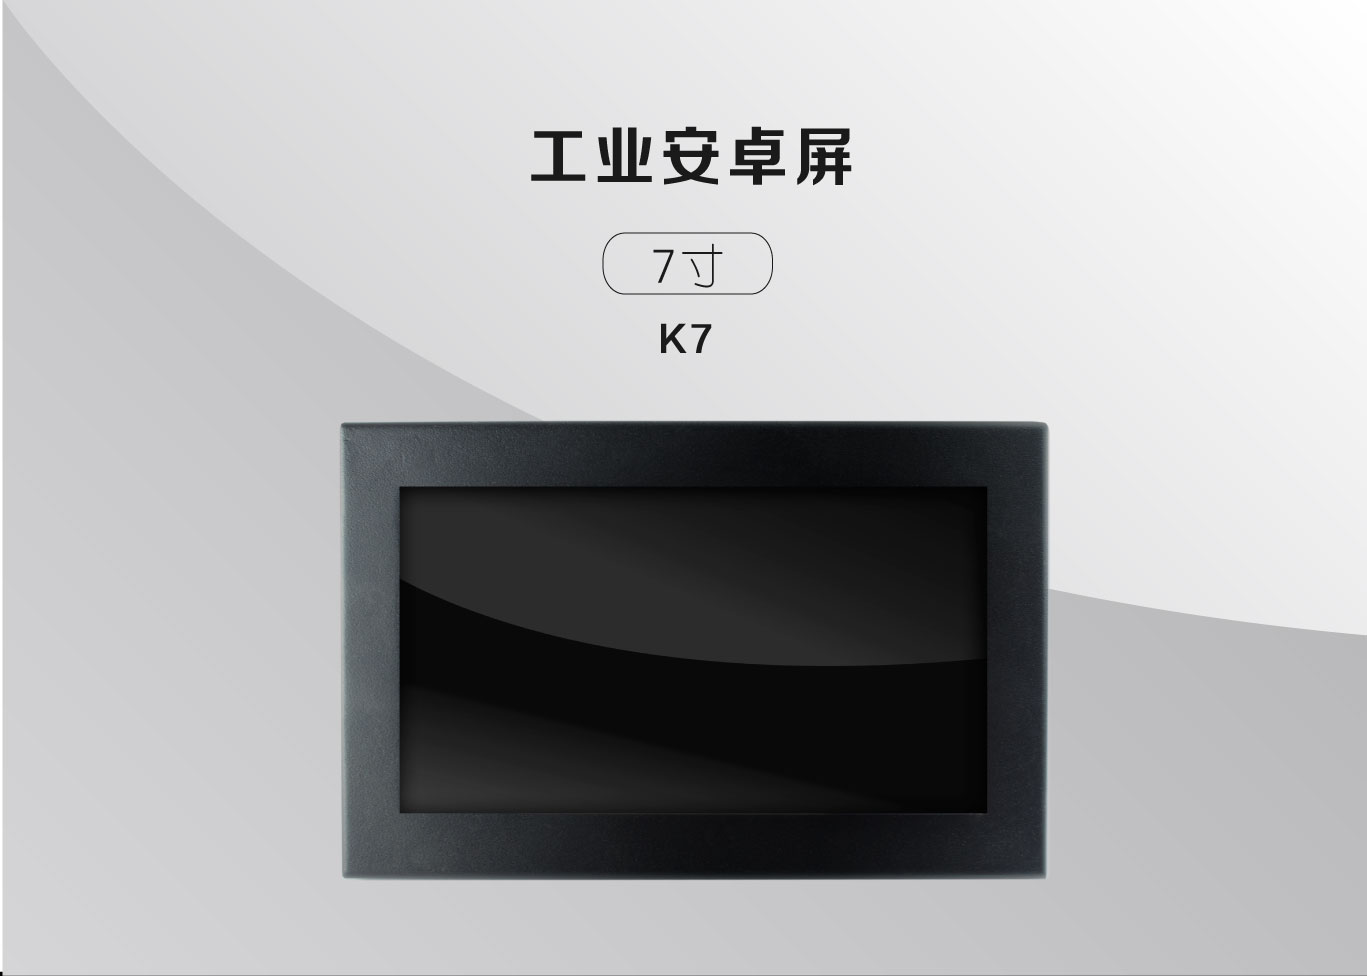 K7-01_01.jpg